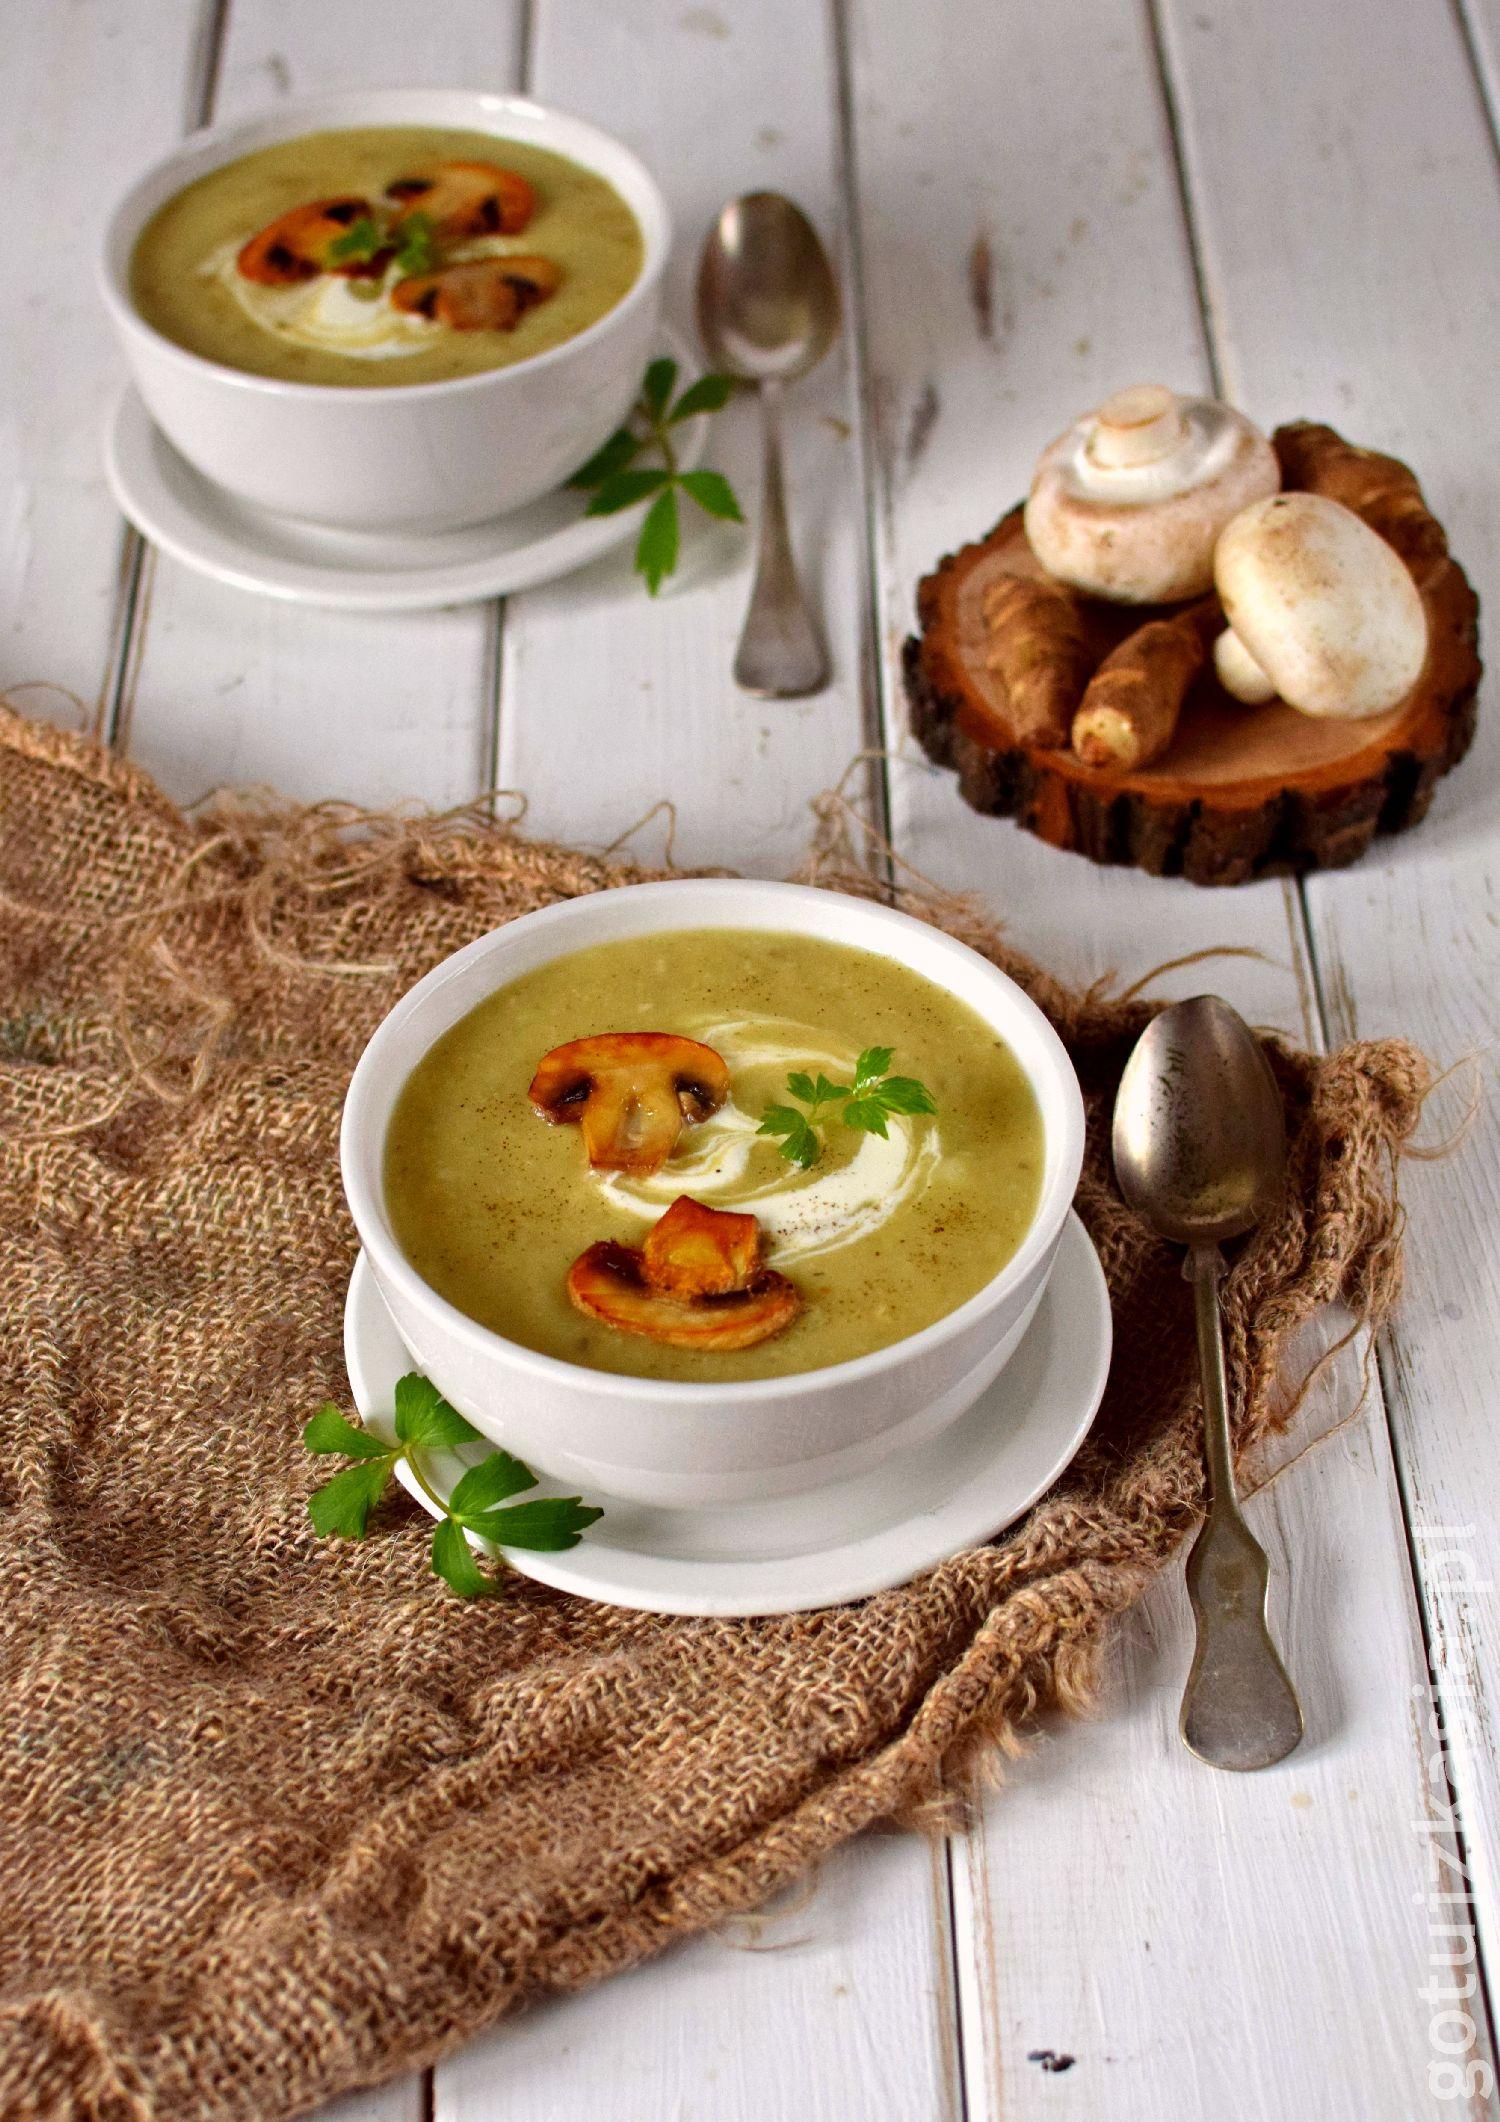 Sieradz_zupa z topinamburem 1